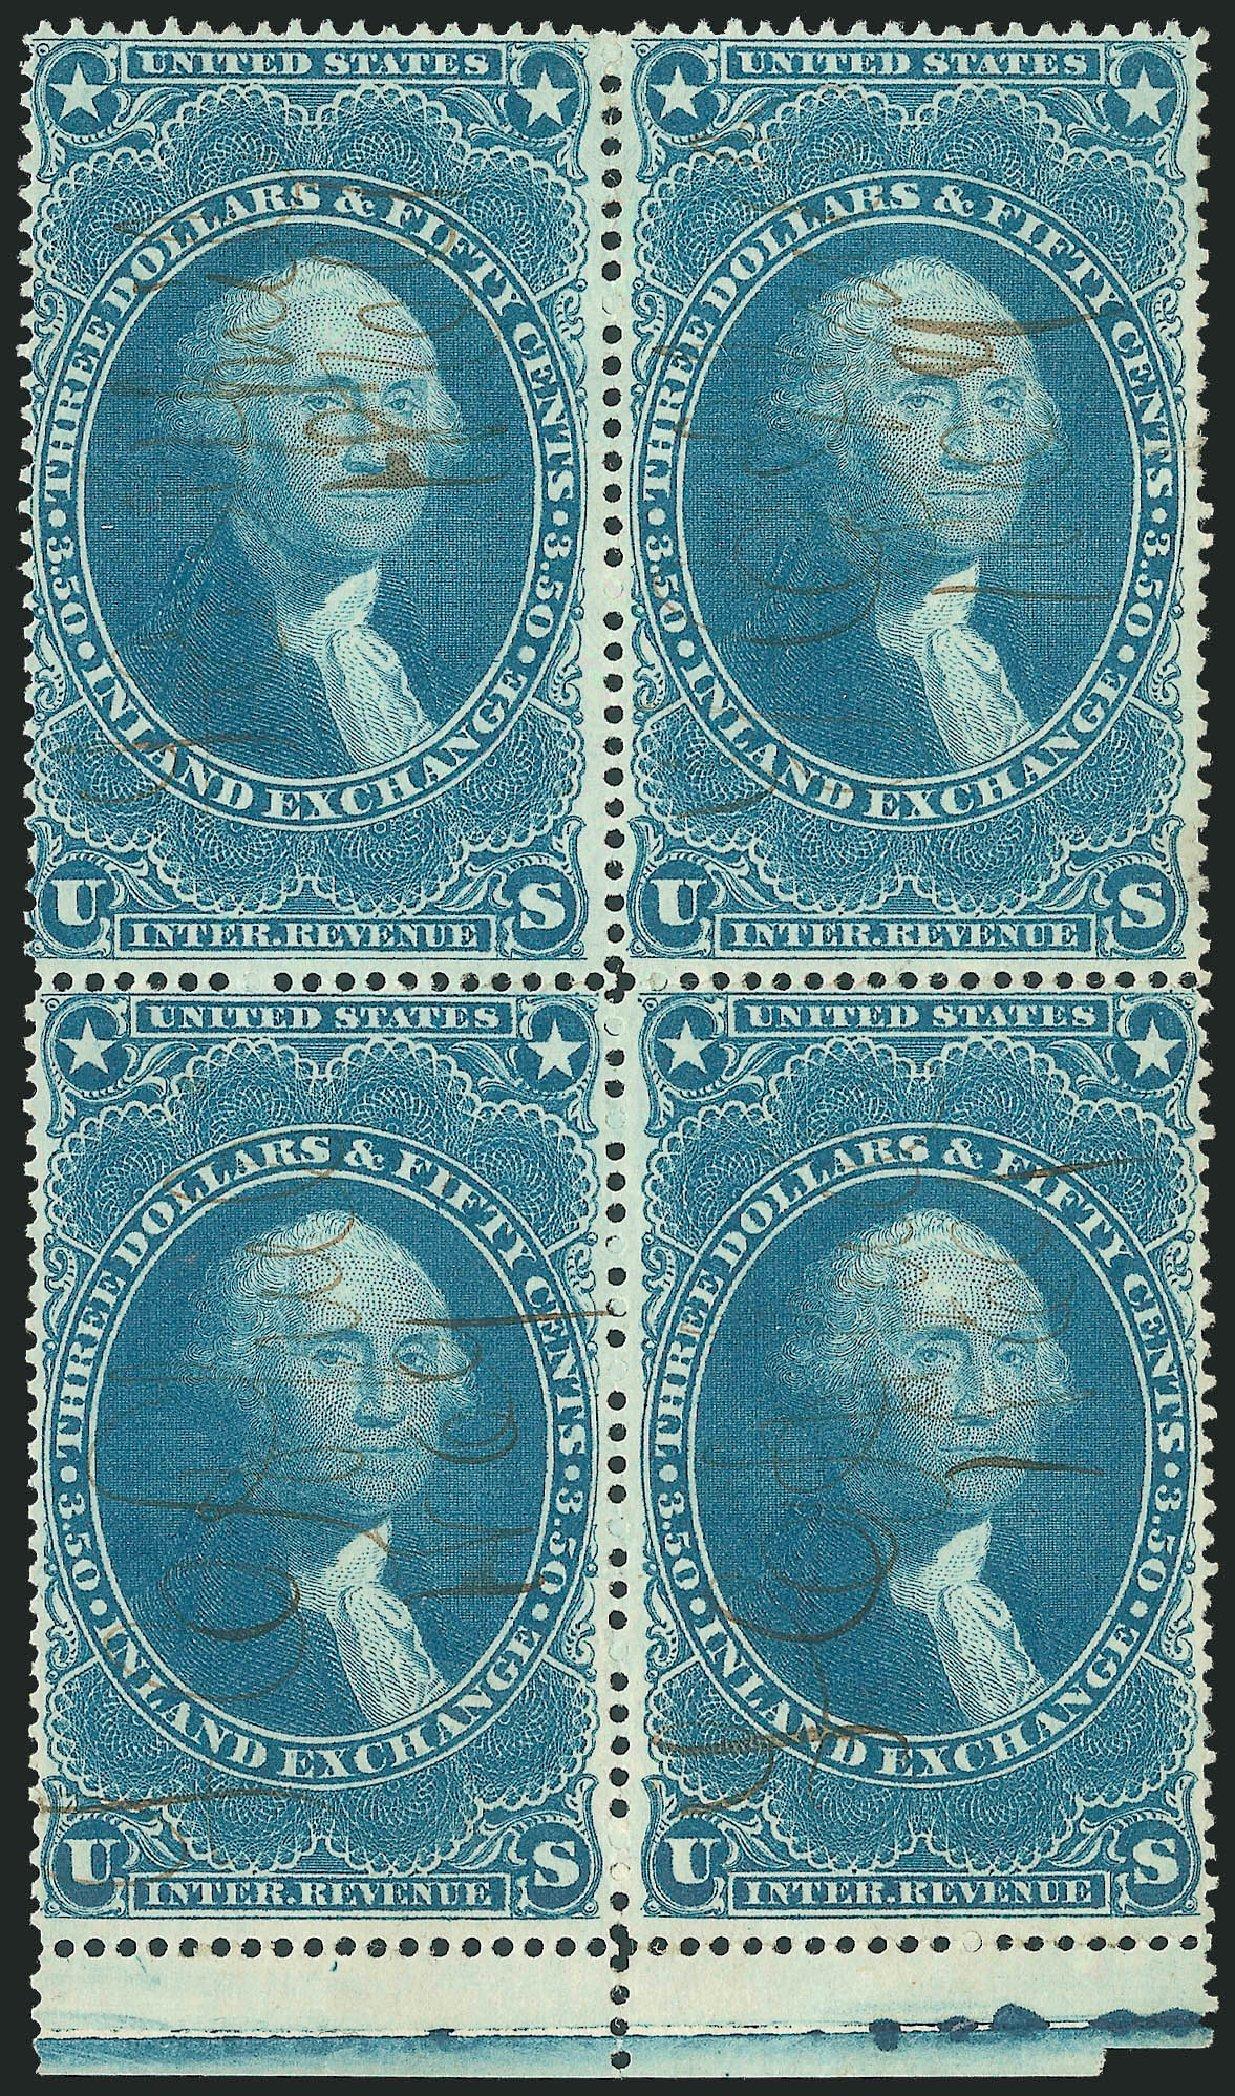 Price of US Stamp Scott Cat. R87 - US$3.50 1863 Revenue Inland Exchange. Robert Siegel Auction Galleries, Dec 2014, Sale 1089, Lot 435